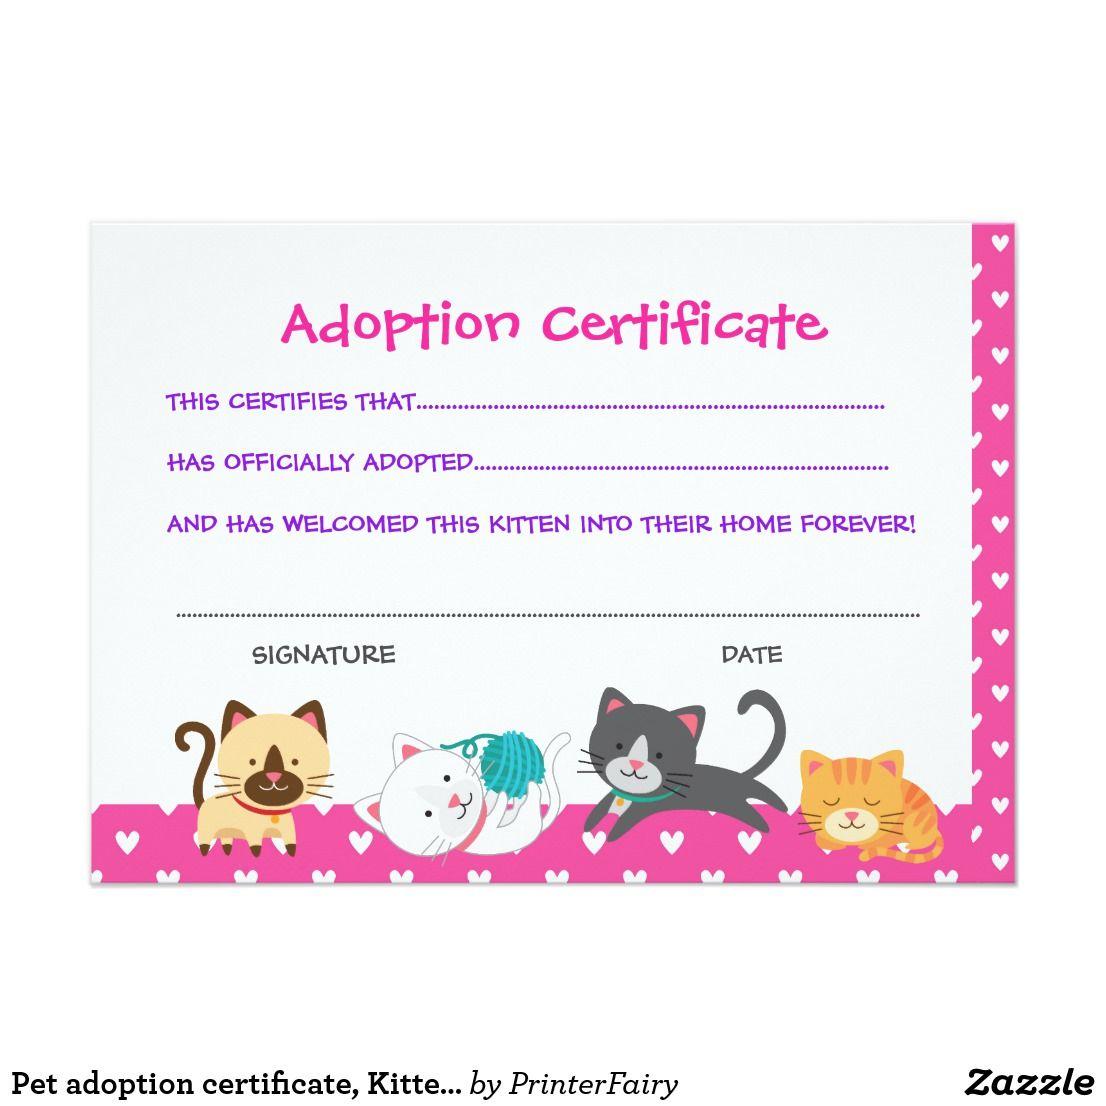 Pet Adoption Certificate Kitten Birthday Invitation Zazzle Com Pet Adoption Certificate Pet Adoption Party Pet Adoption Birthday Party